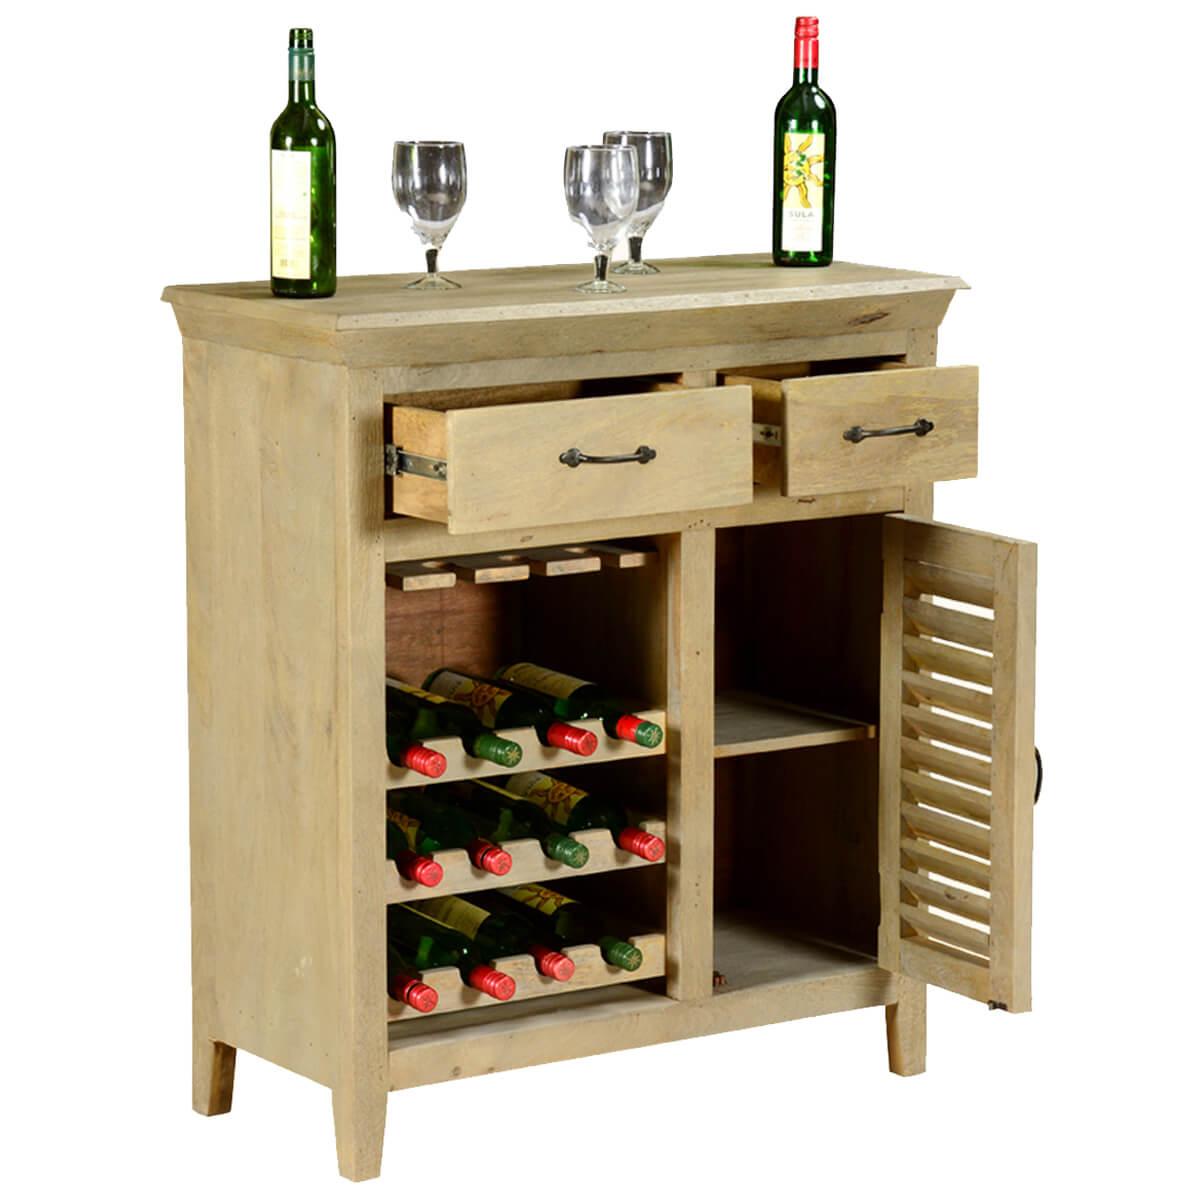 Oklahoma Rustic Mango Wood 2 Drawer Bar Cabinet With Wine